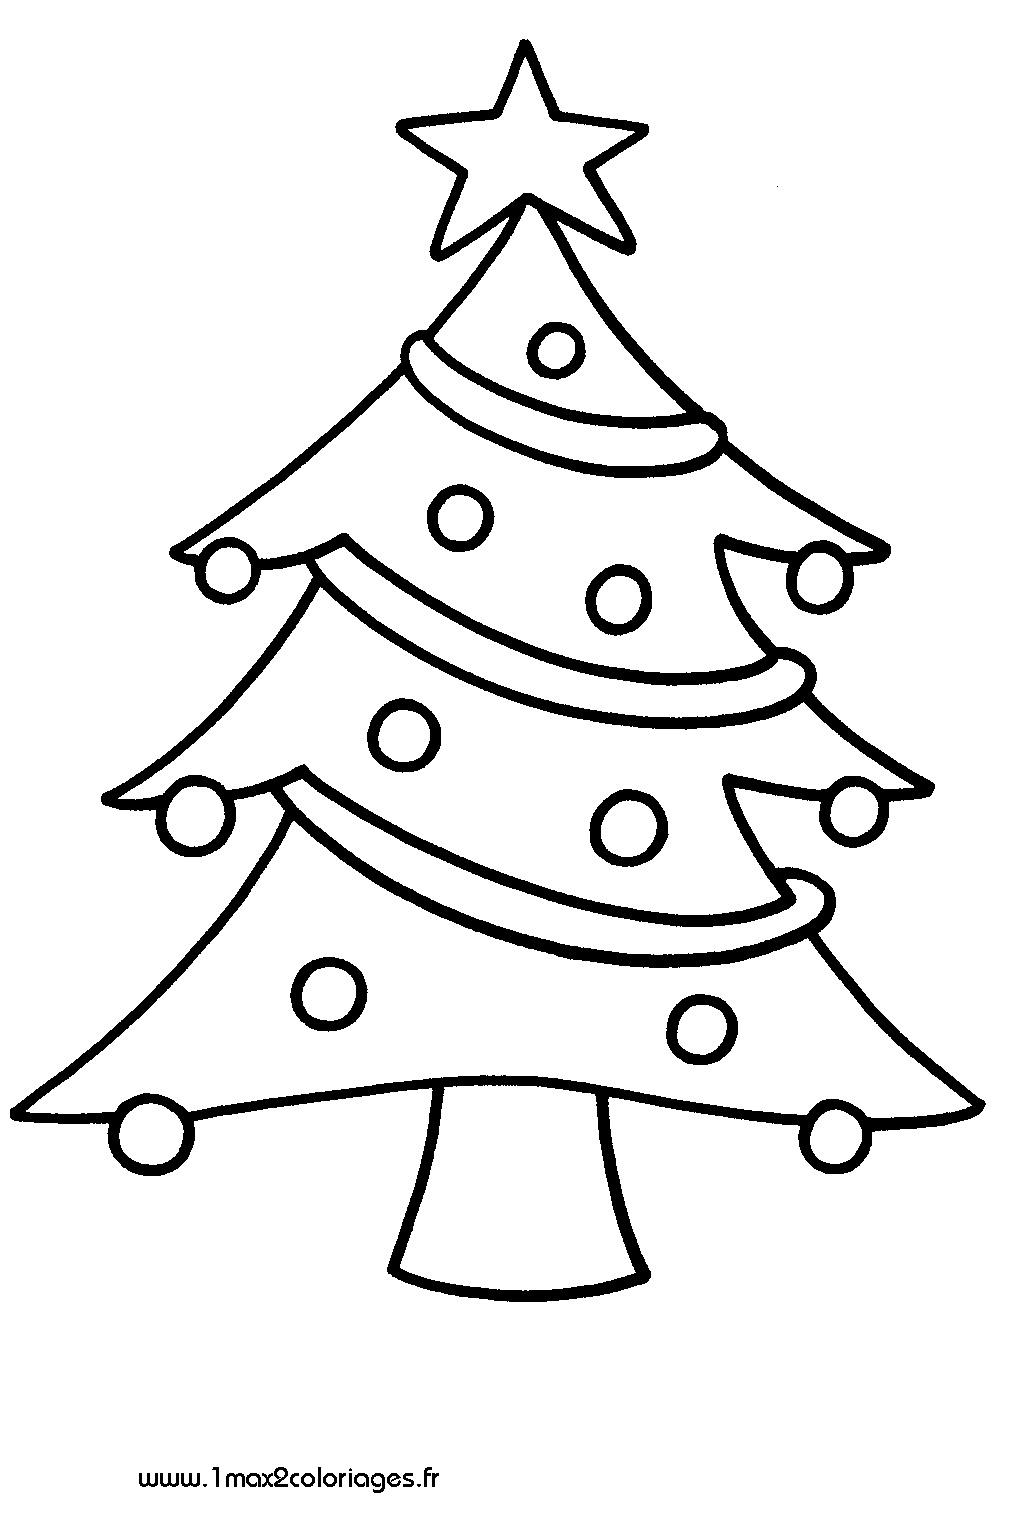 Dessin Facile Sapin De Noel